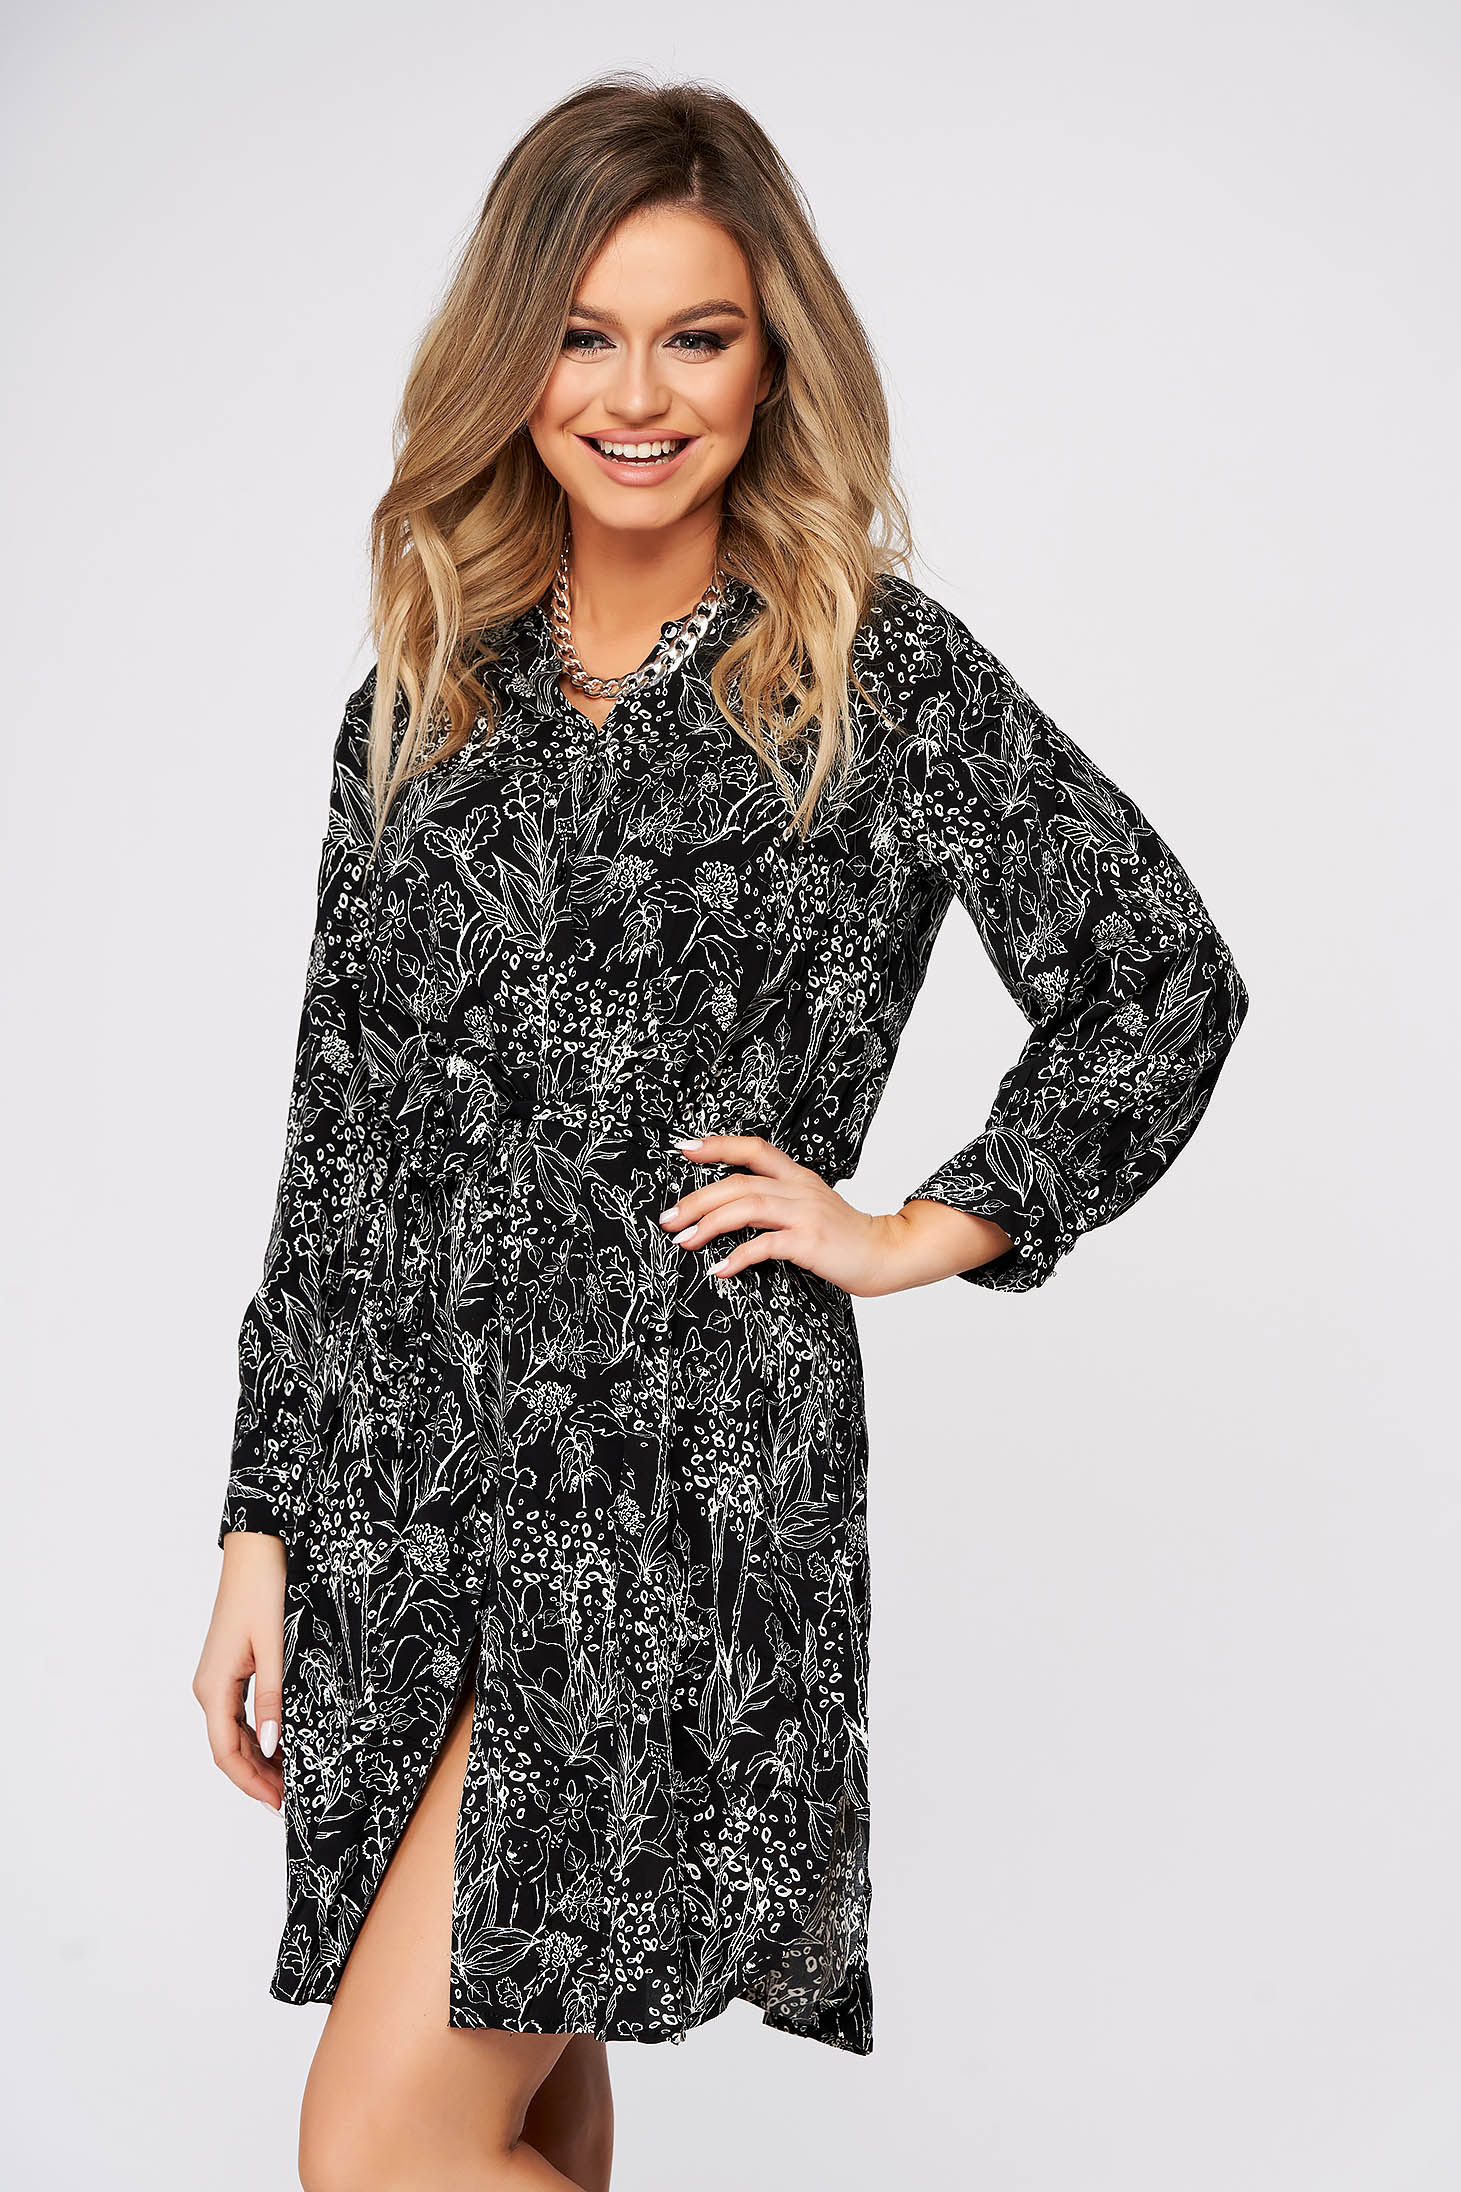 Dress cloche with v-neckline airy fabric